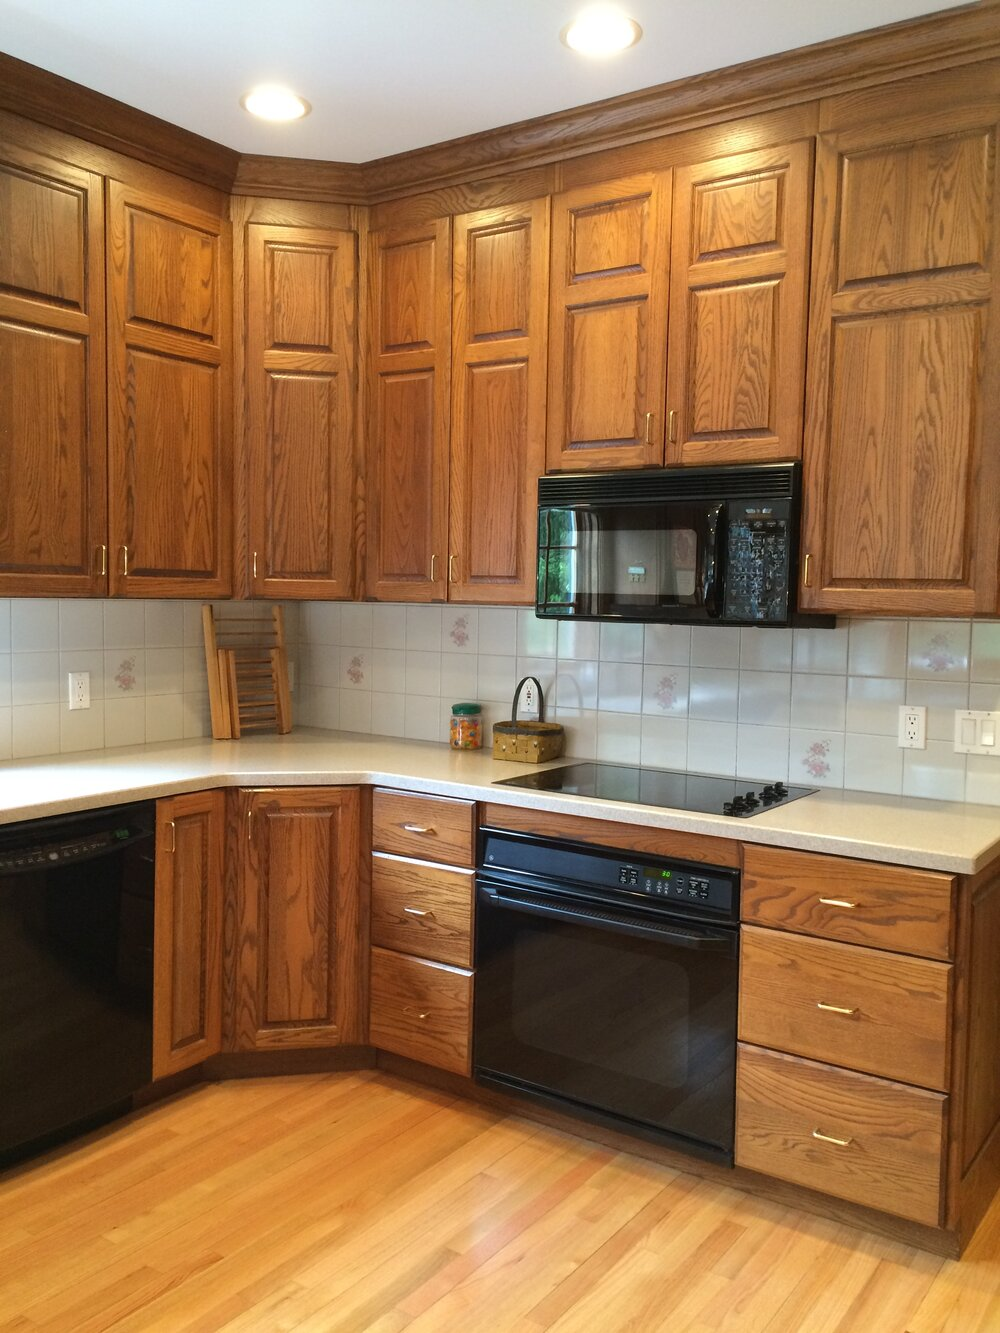 How to make an oak kitchen cool again  — COPPER CORNERS